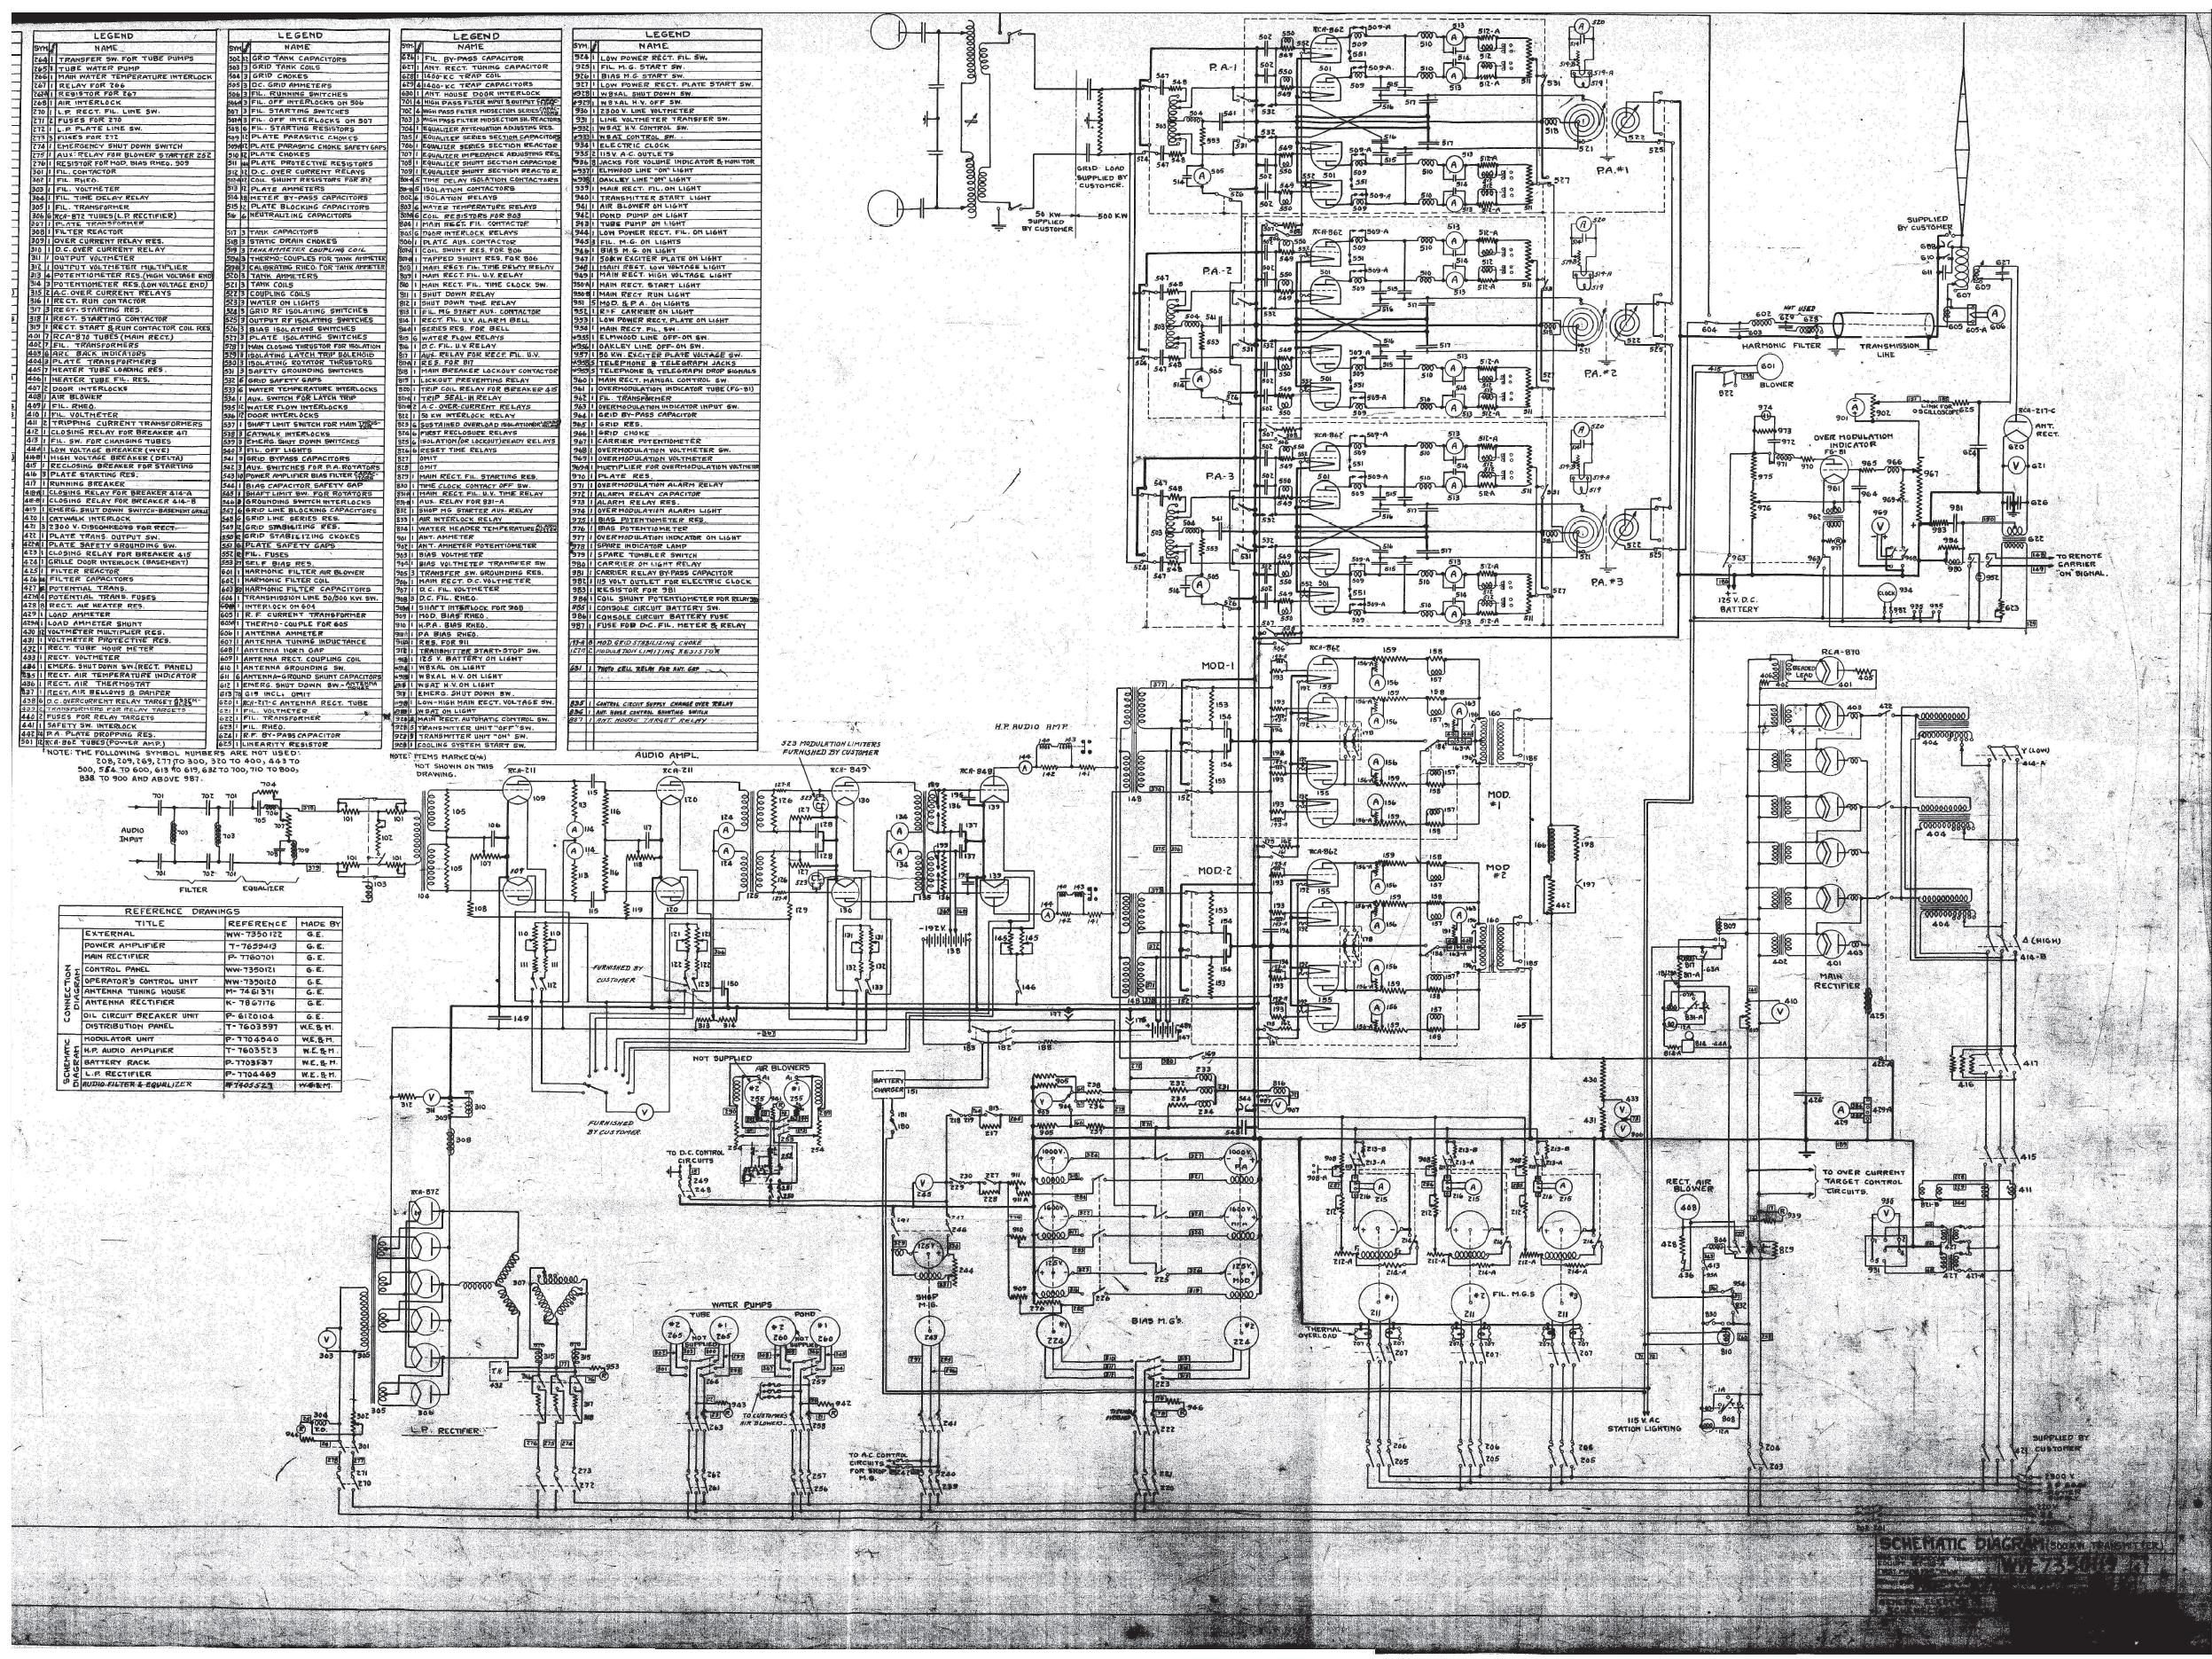 Wlw Documents Am Transmitter Circuit Medium Resolution 500kw Xmtr Rf Mod Schematic 25 Megabytes Jpeg